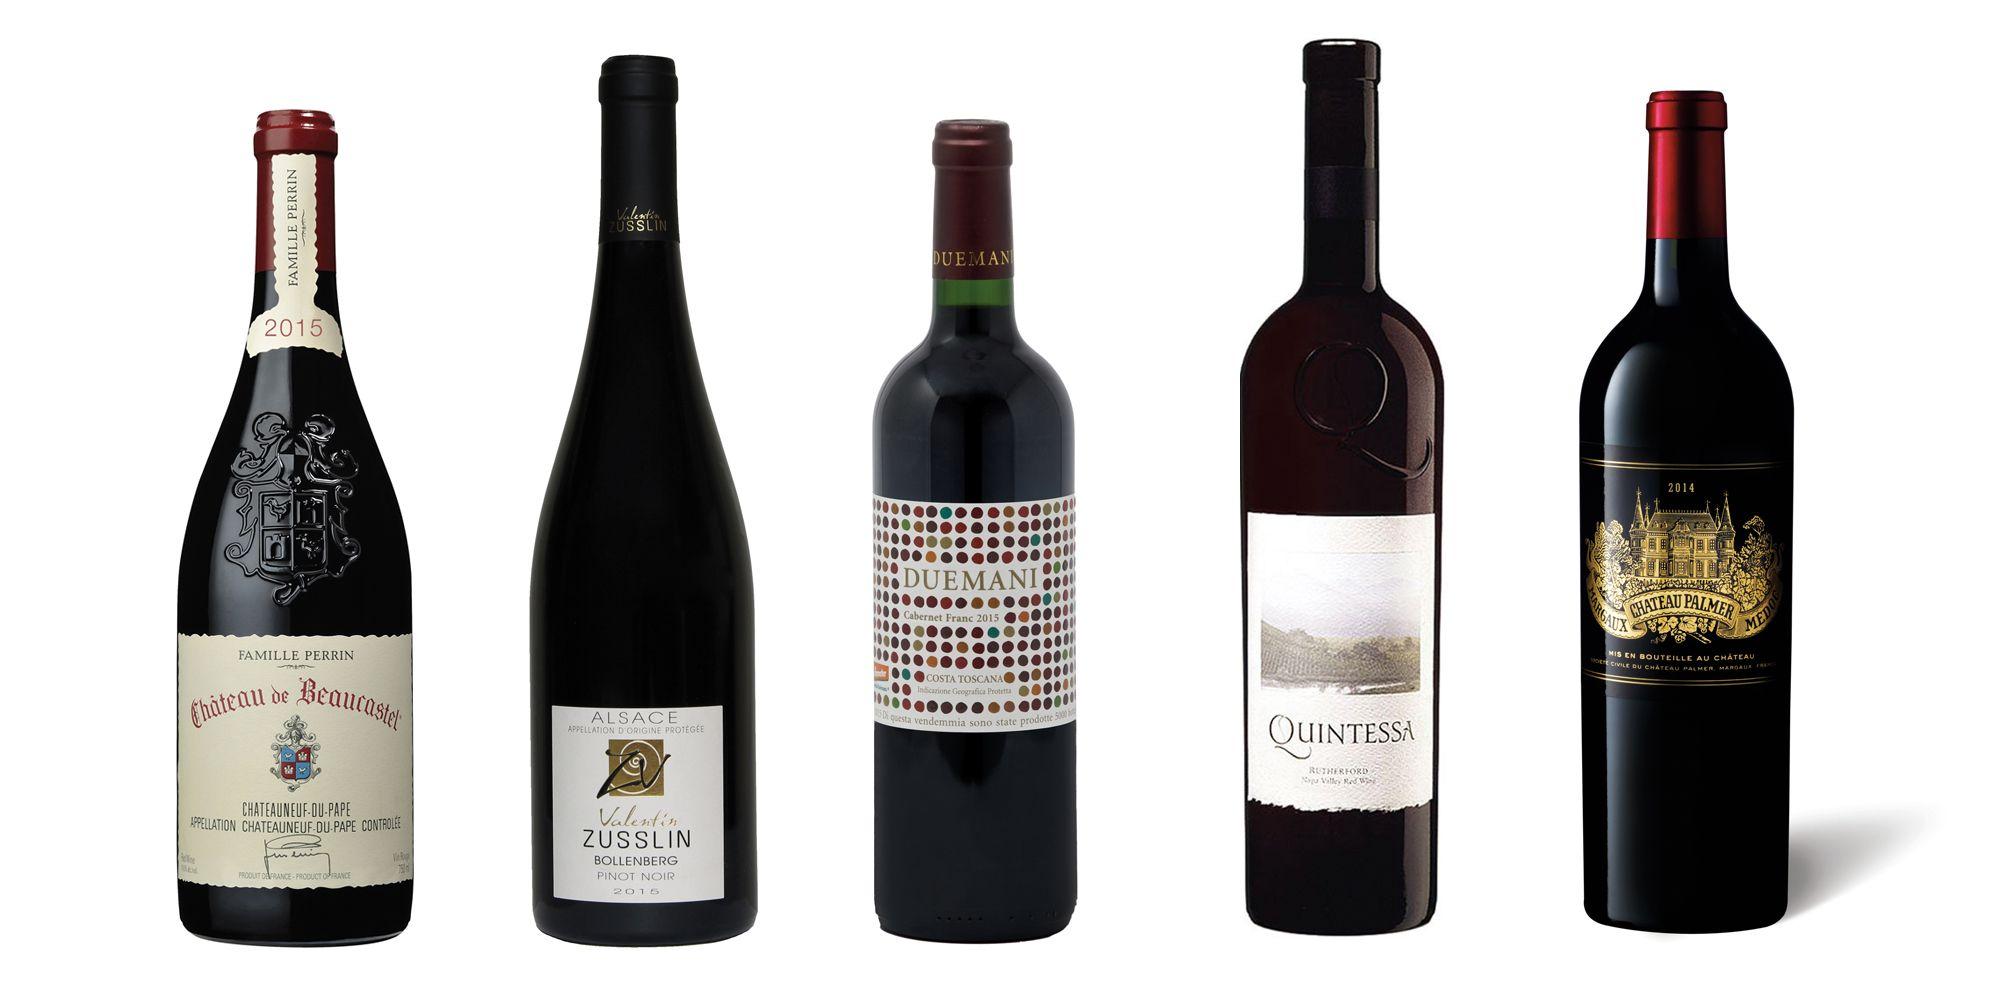 8 Brilliant Biodynamic Wines, According To James Suckling